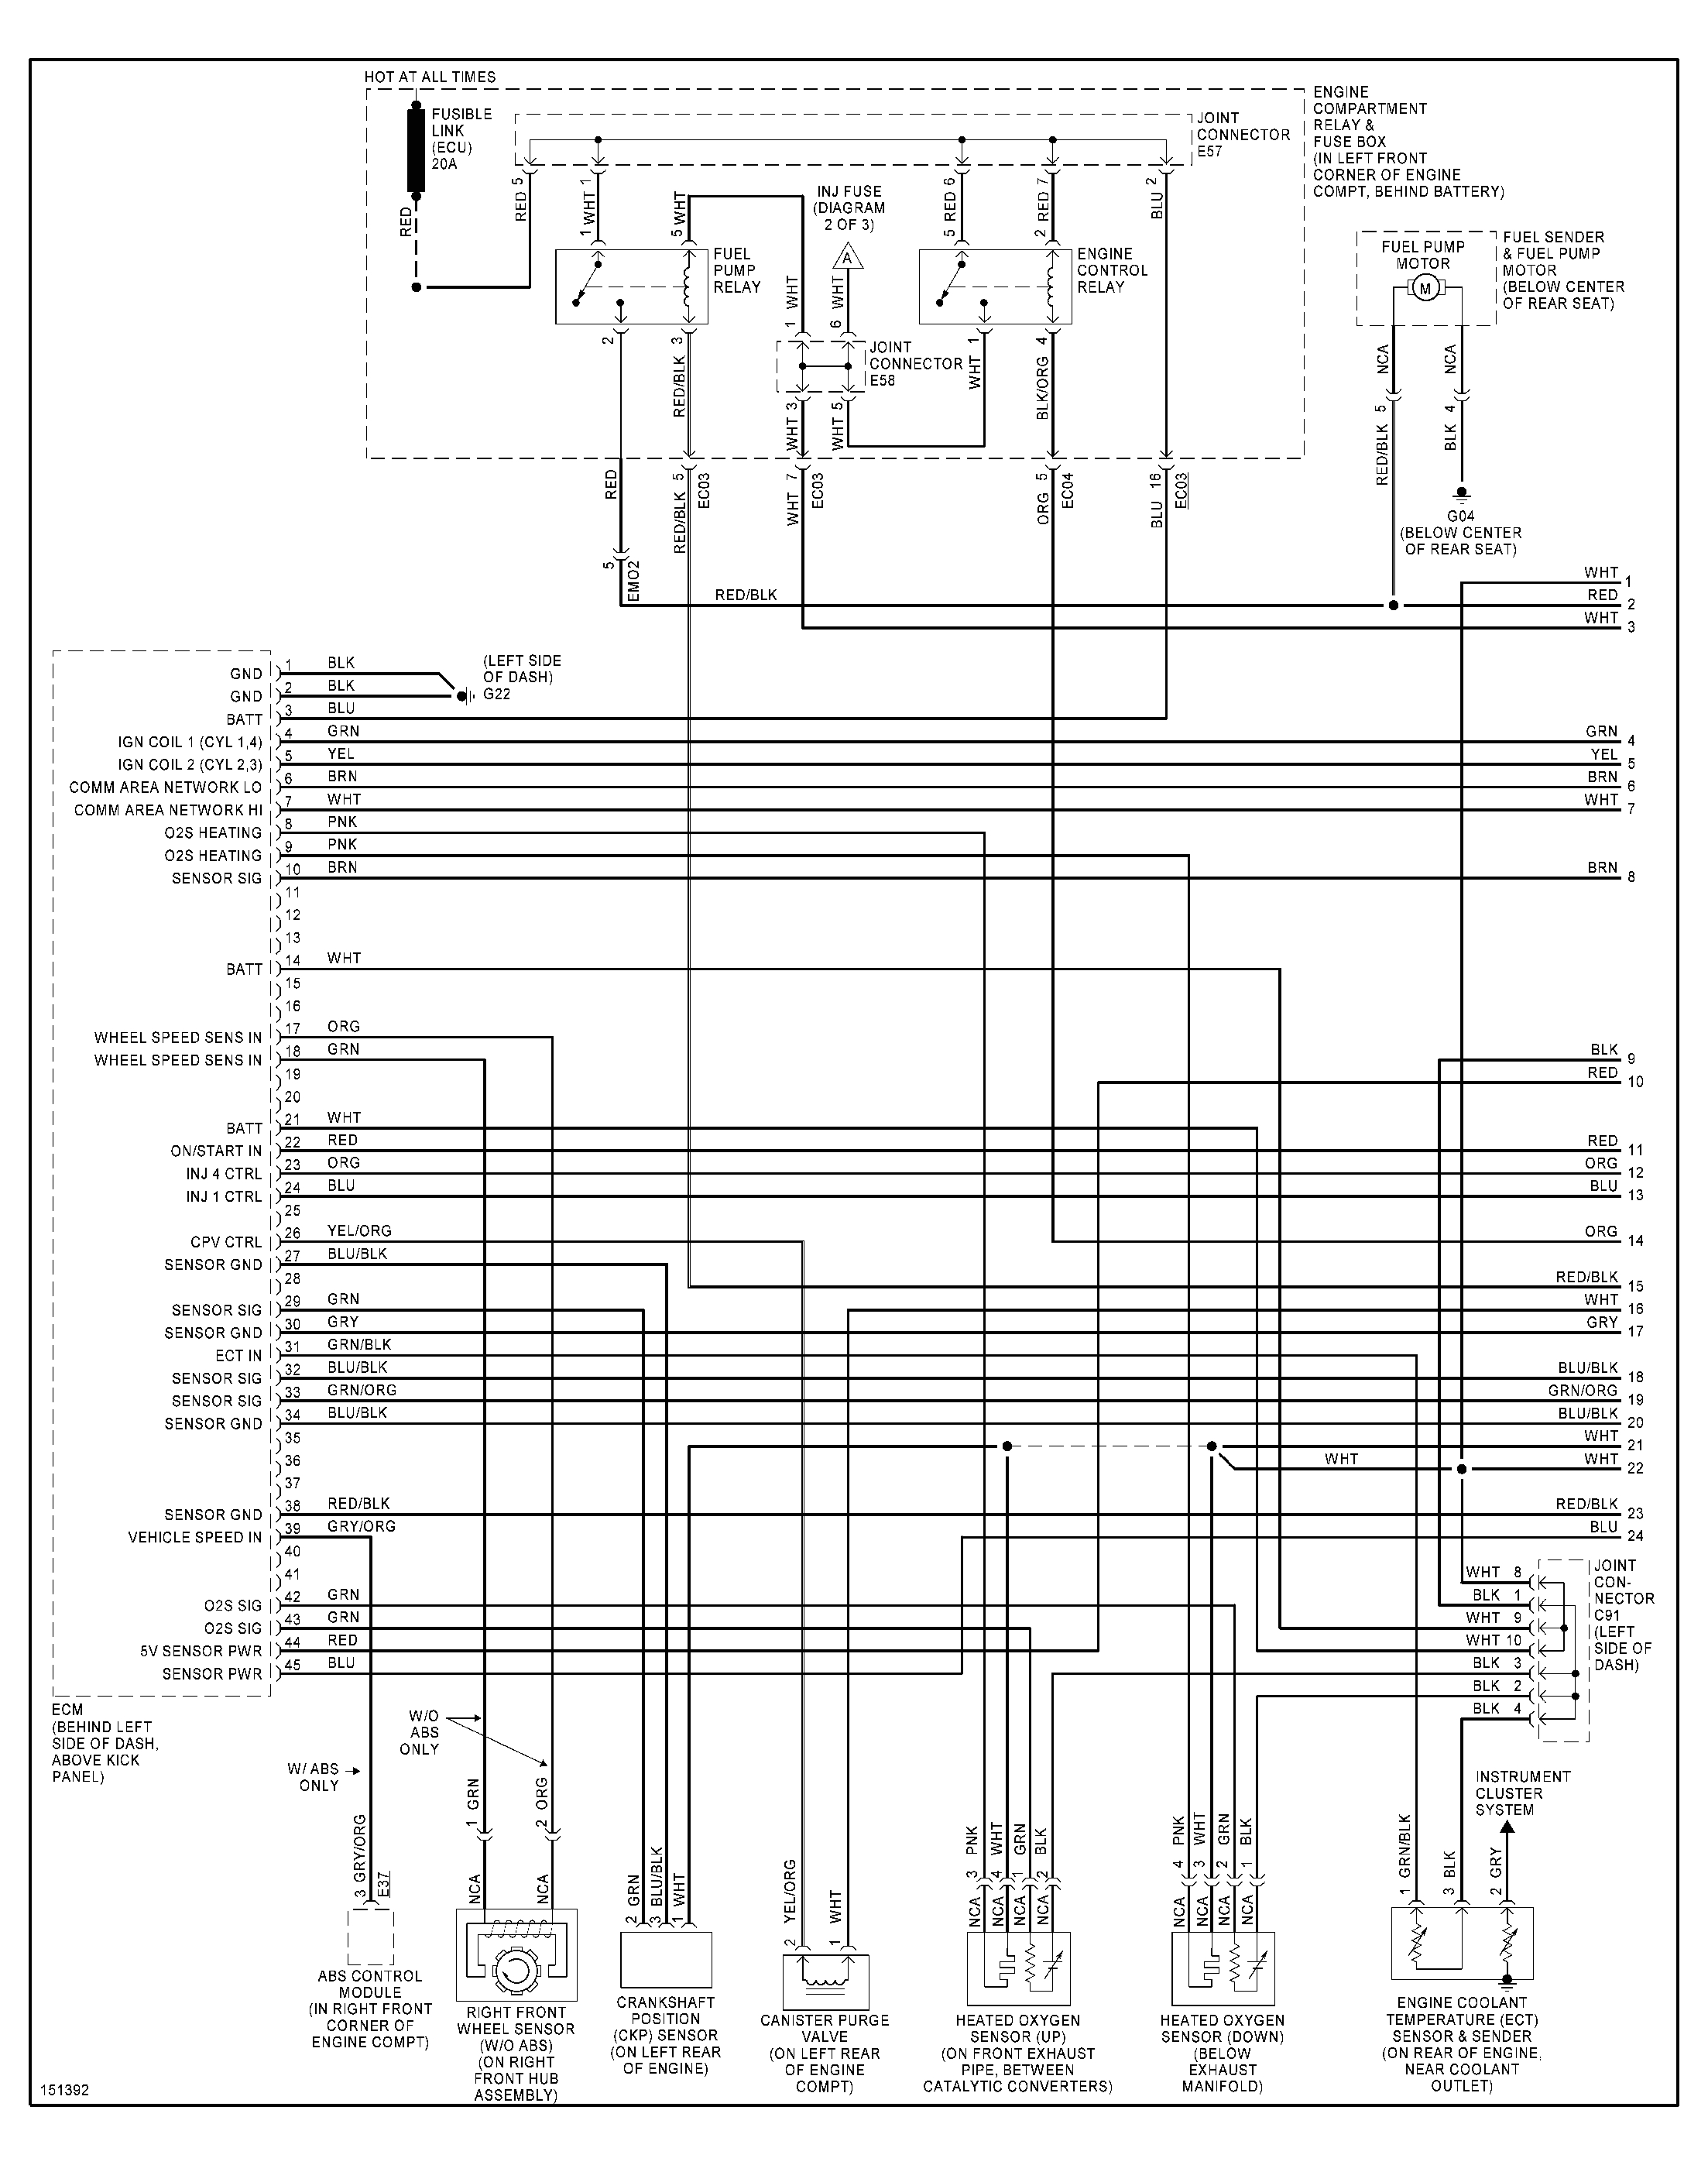 2012 Hyundai Elantra Wiring Diagram 2008 Hyundai Santa Fe Wiring Diagram Database